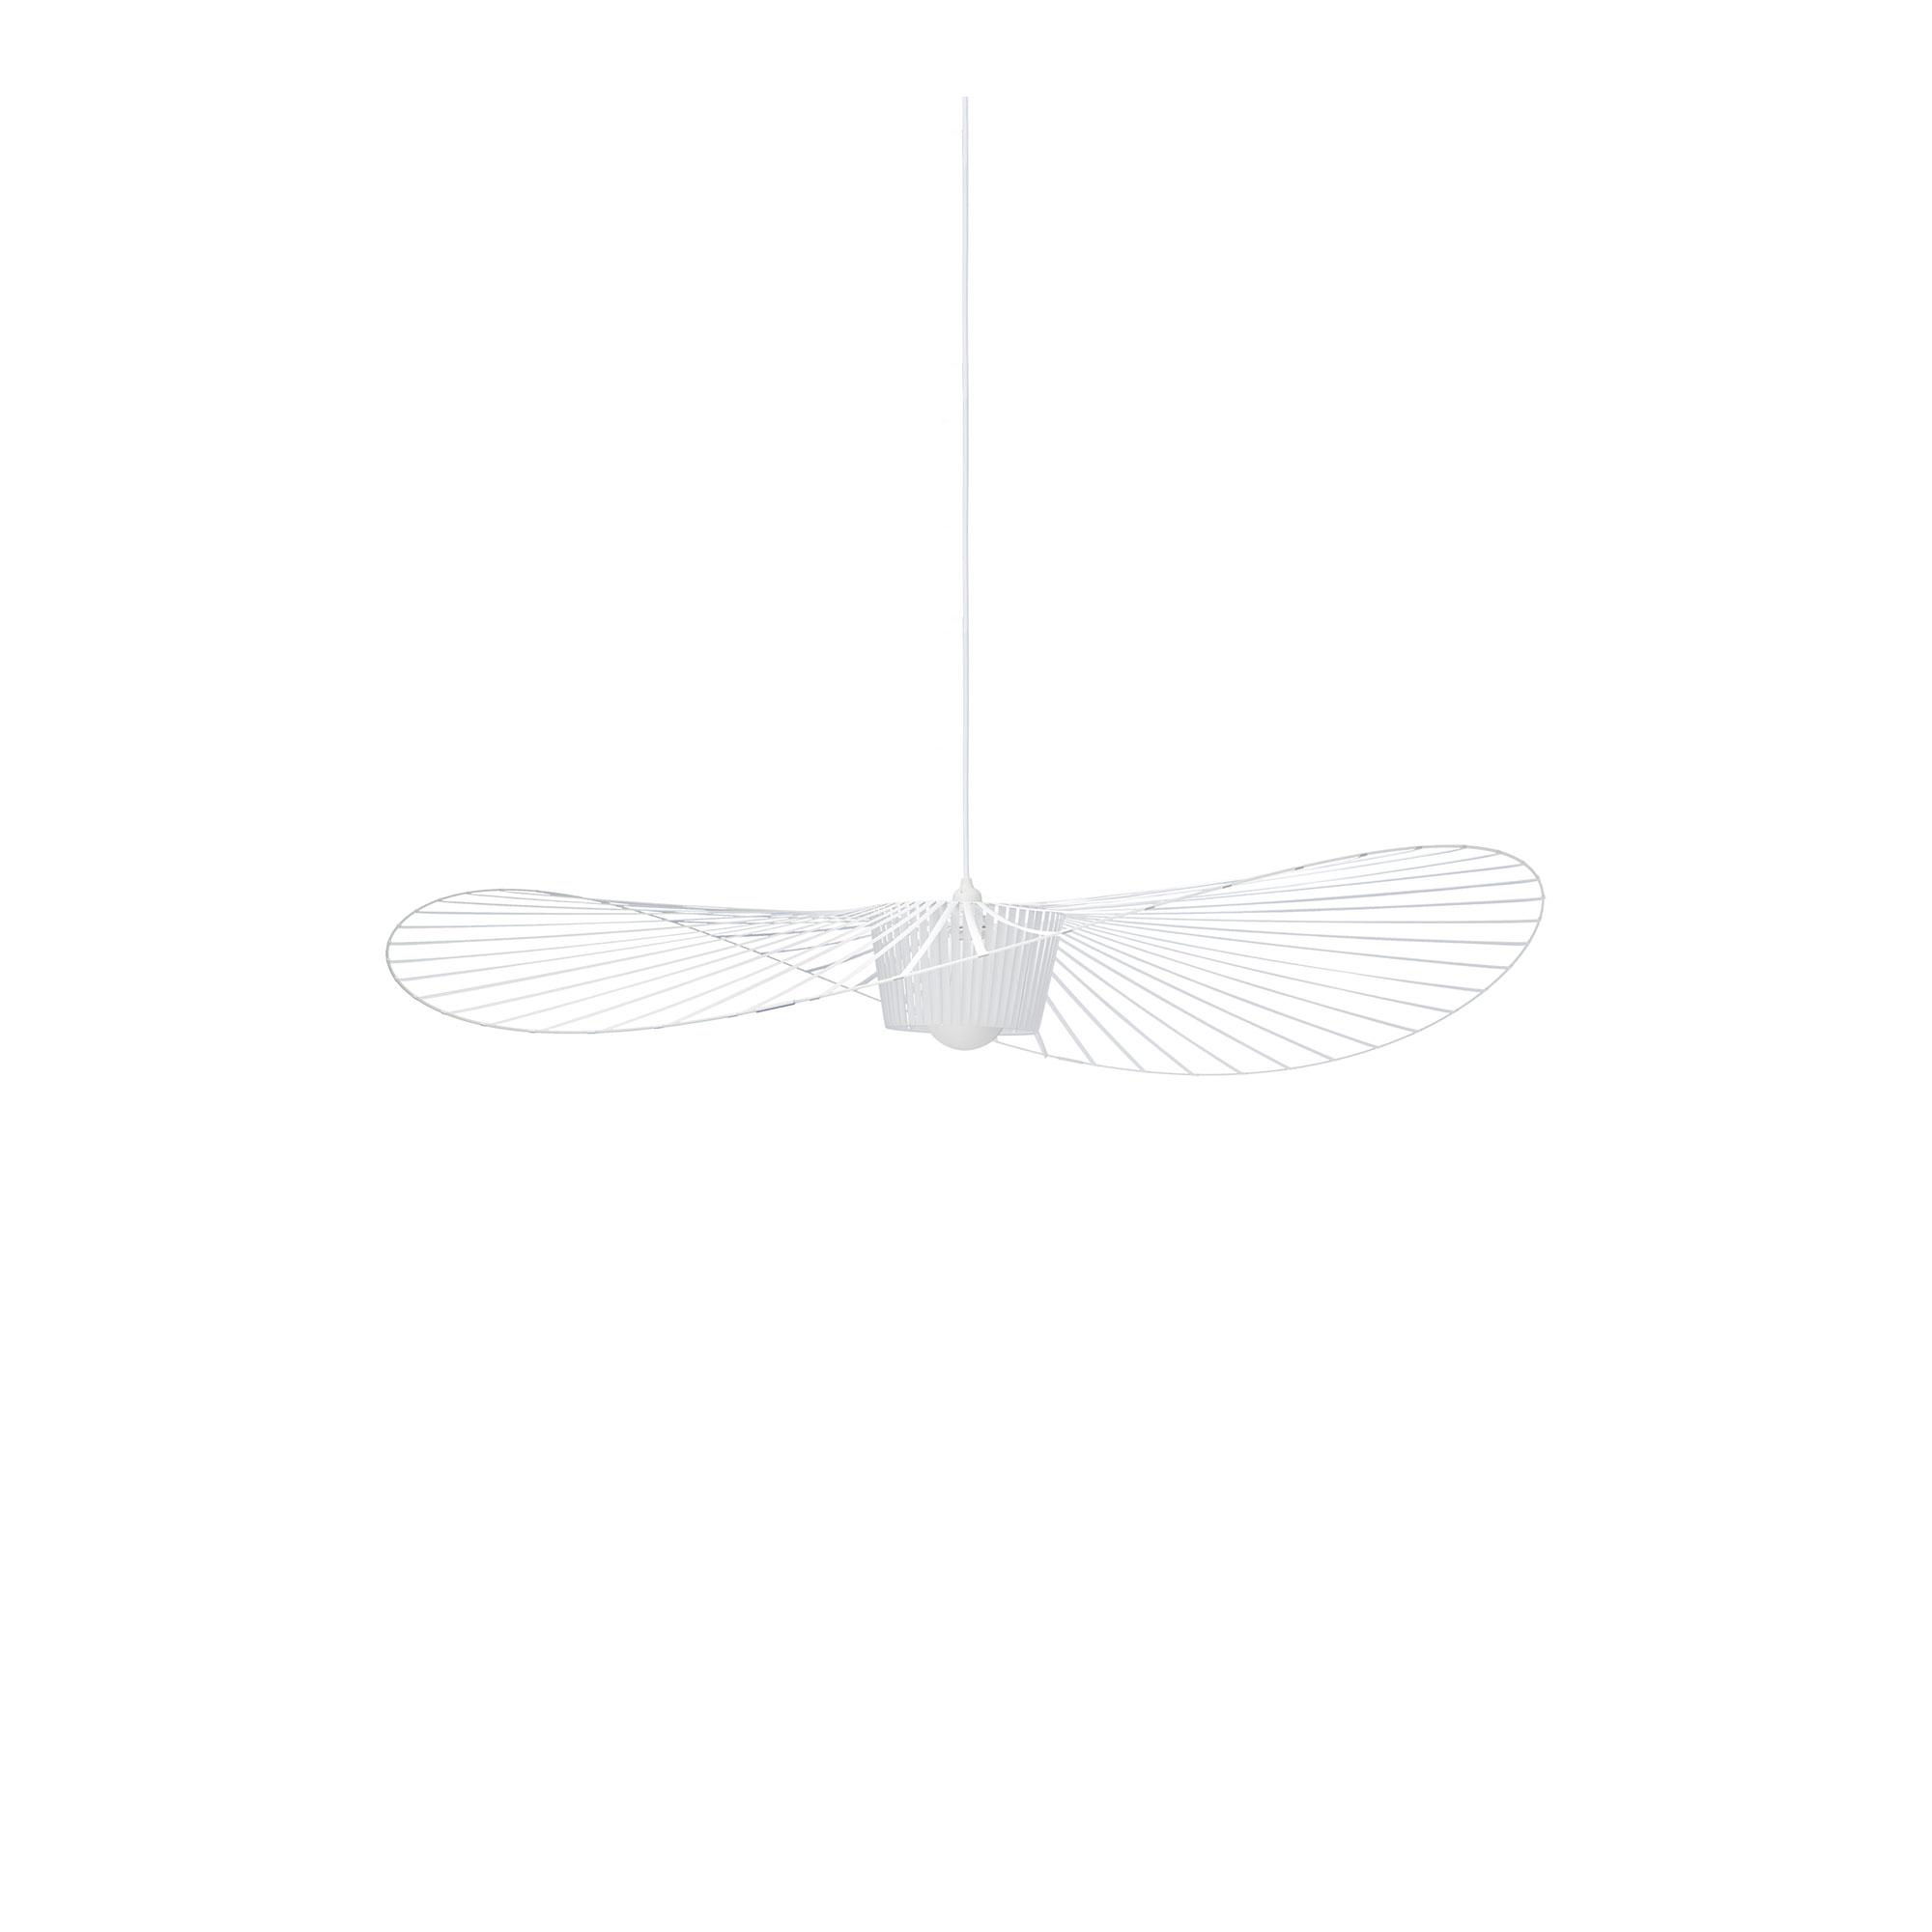 Petite Friture Vertigo 140cm Pendellampa • Se priser (13